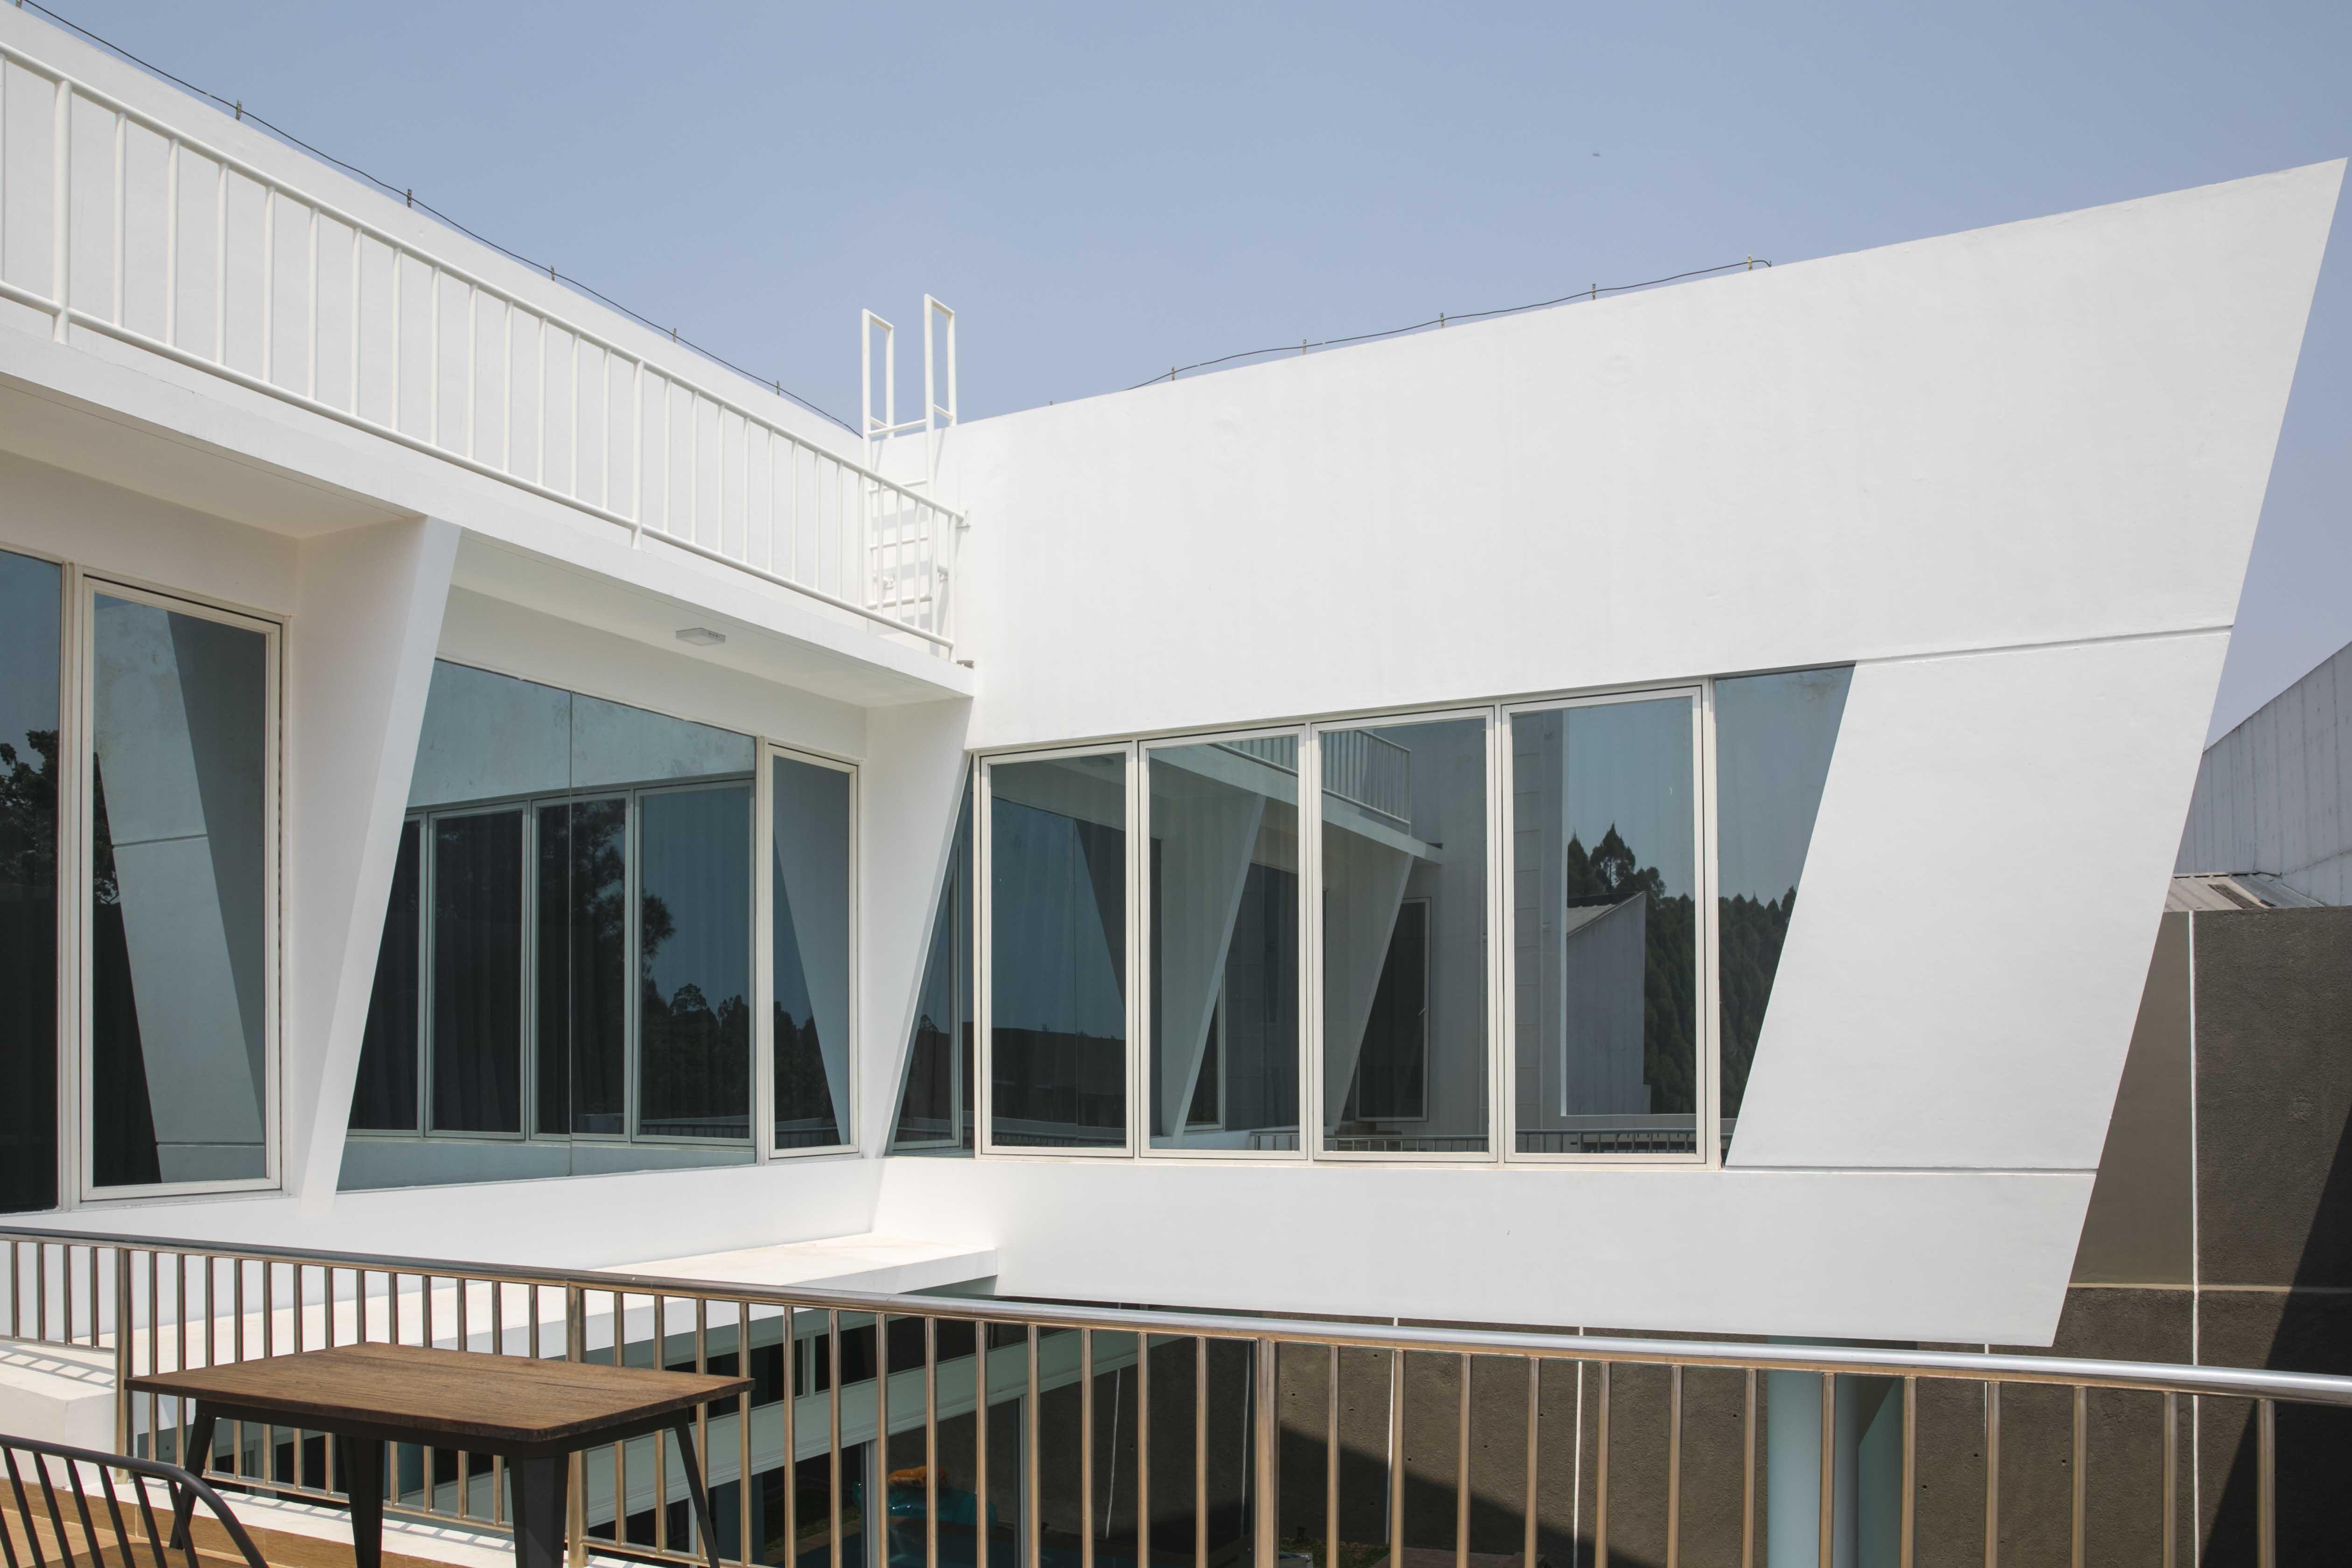 Gaya Modern Kontemporer Dan Futuristik Pada Rumah Italic House Rumah123 Com